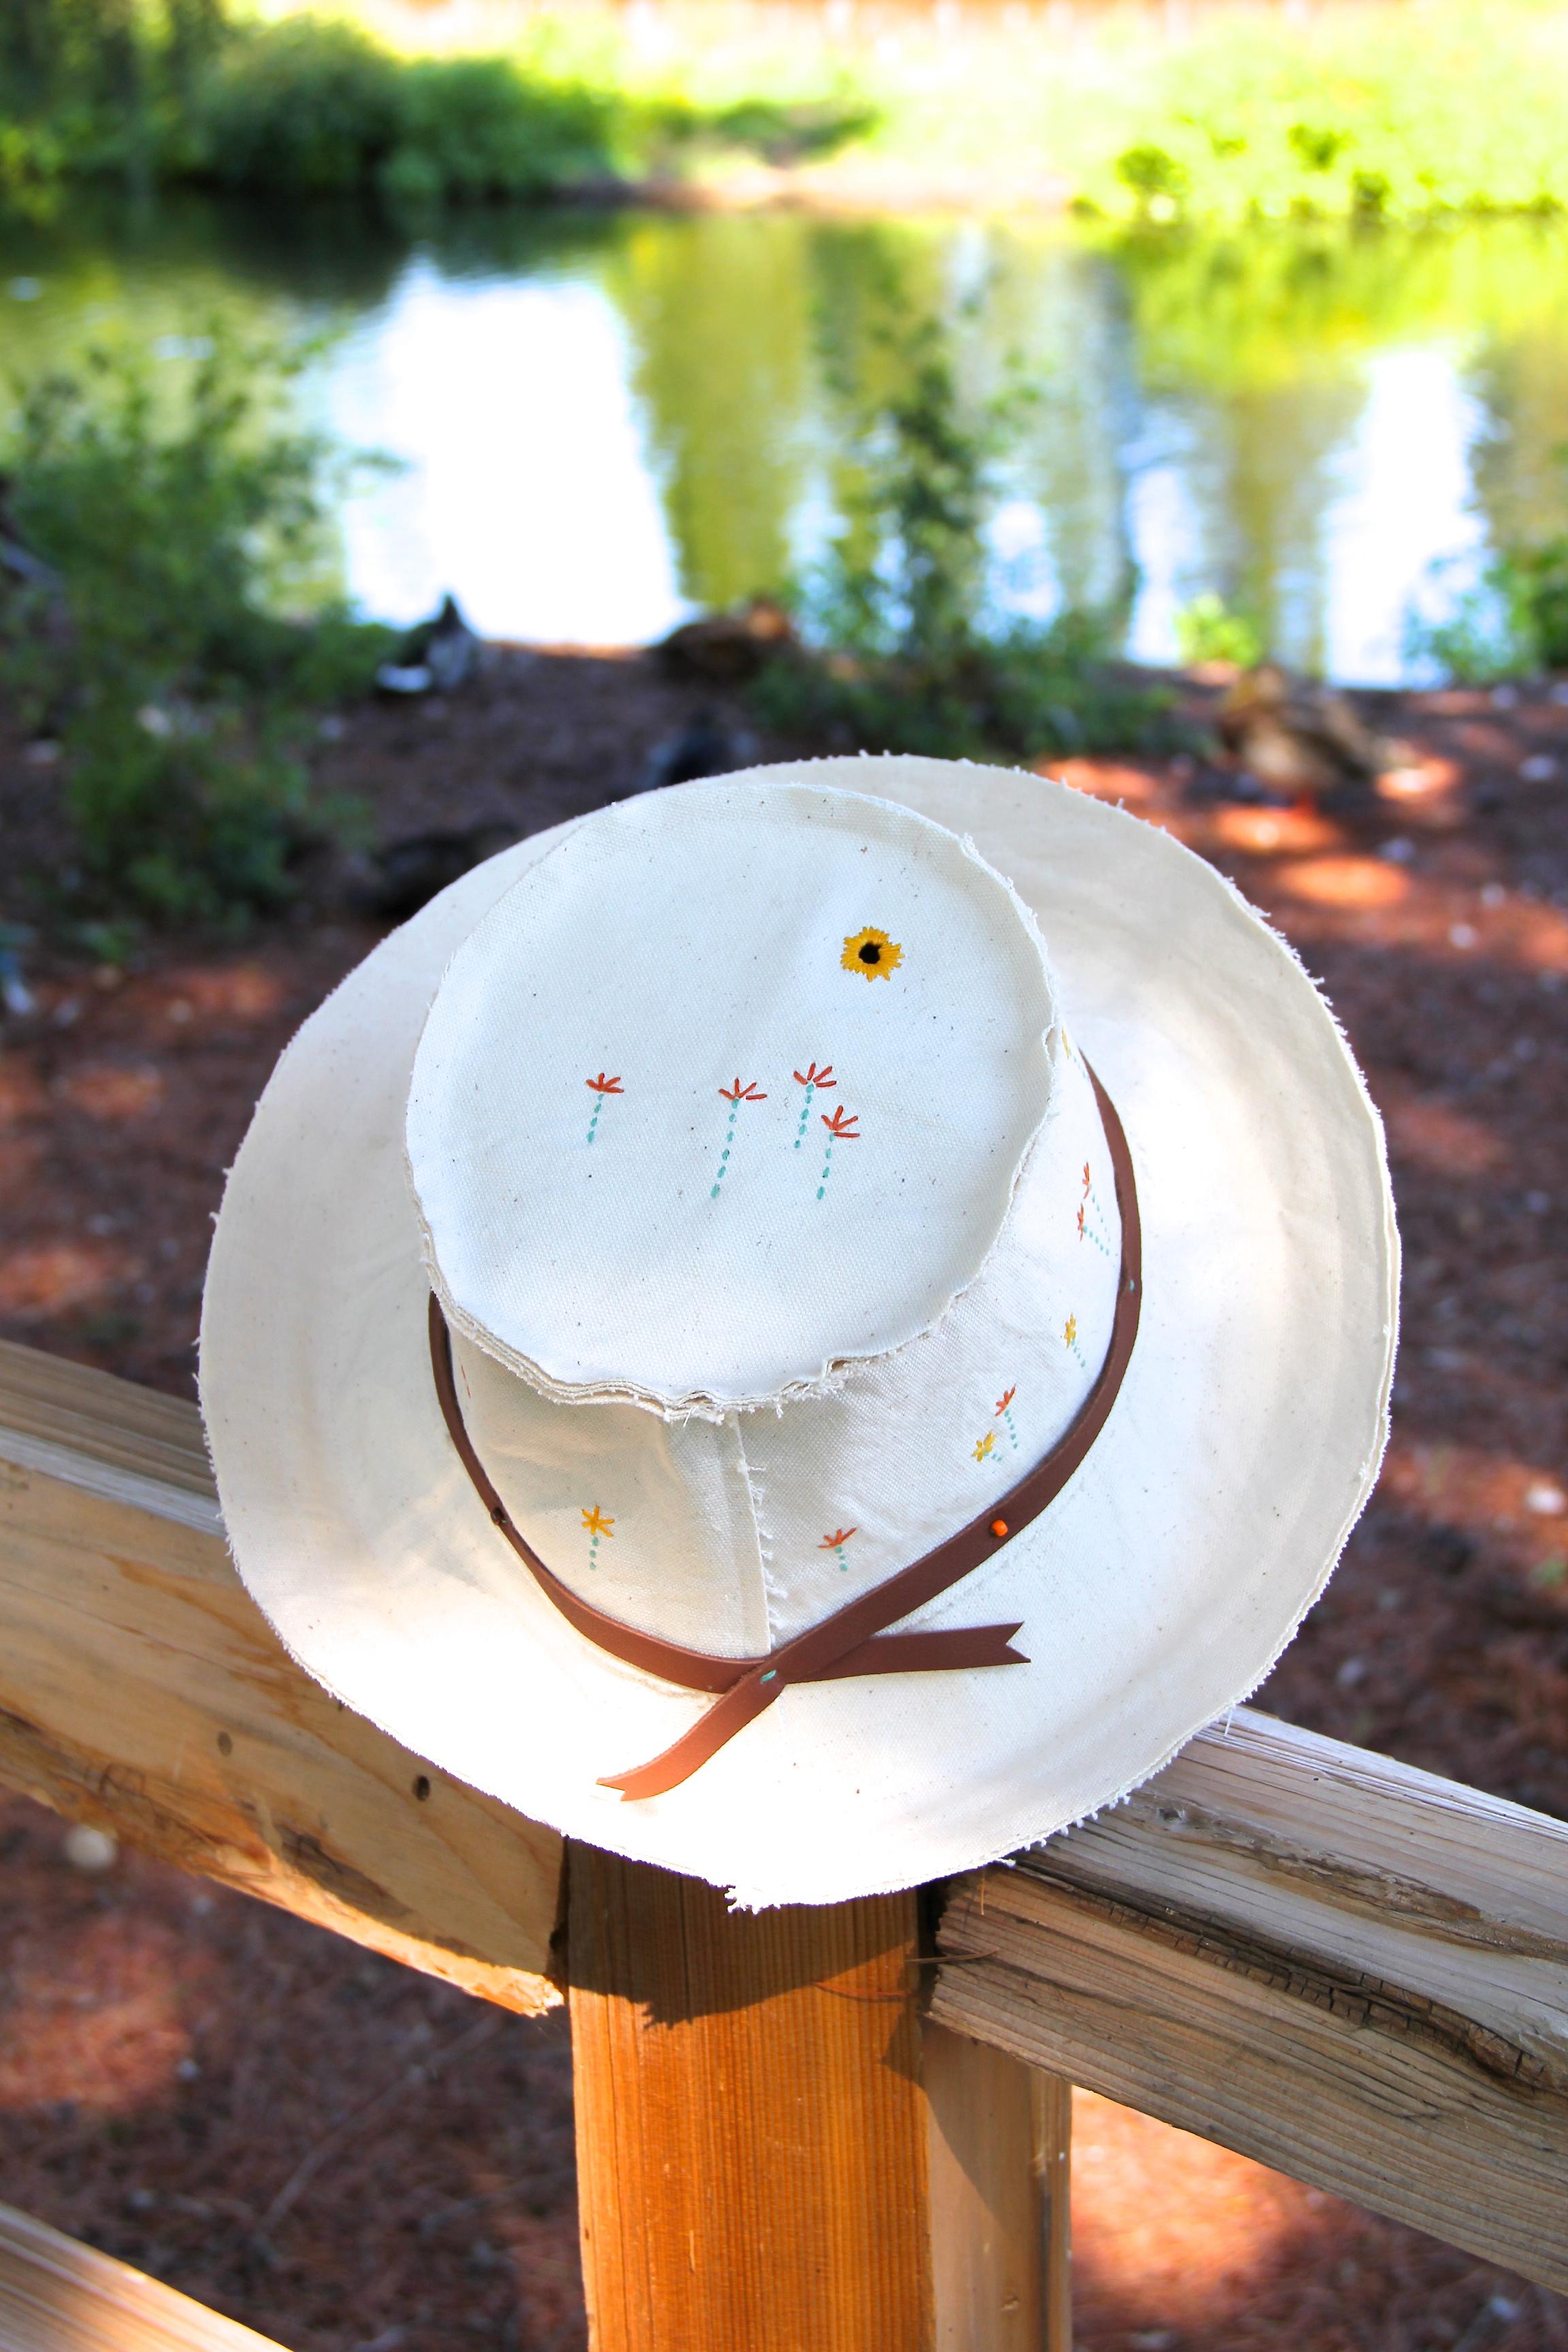 Sun 'n Shade 'Wildflower' Hat